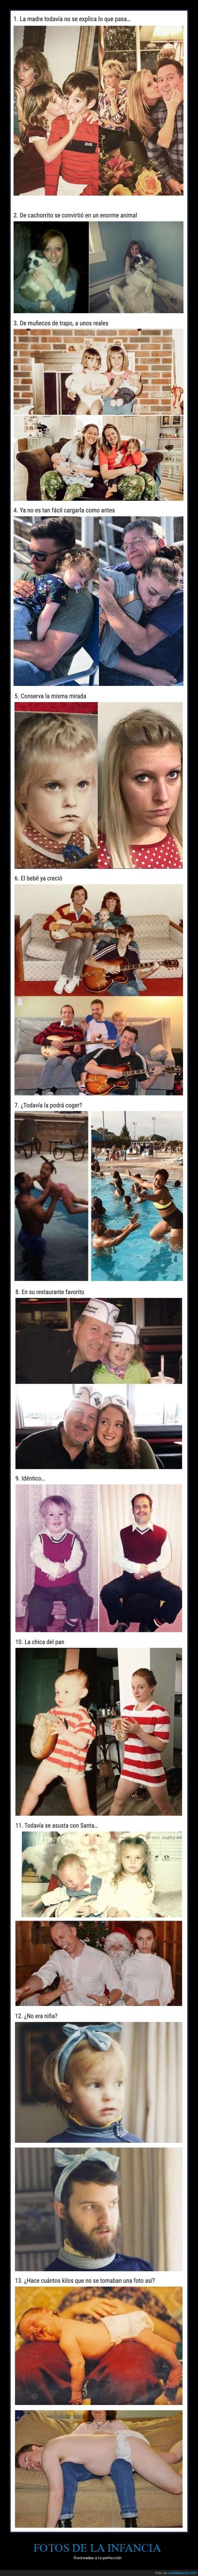 fotos,infancia,recreando